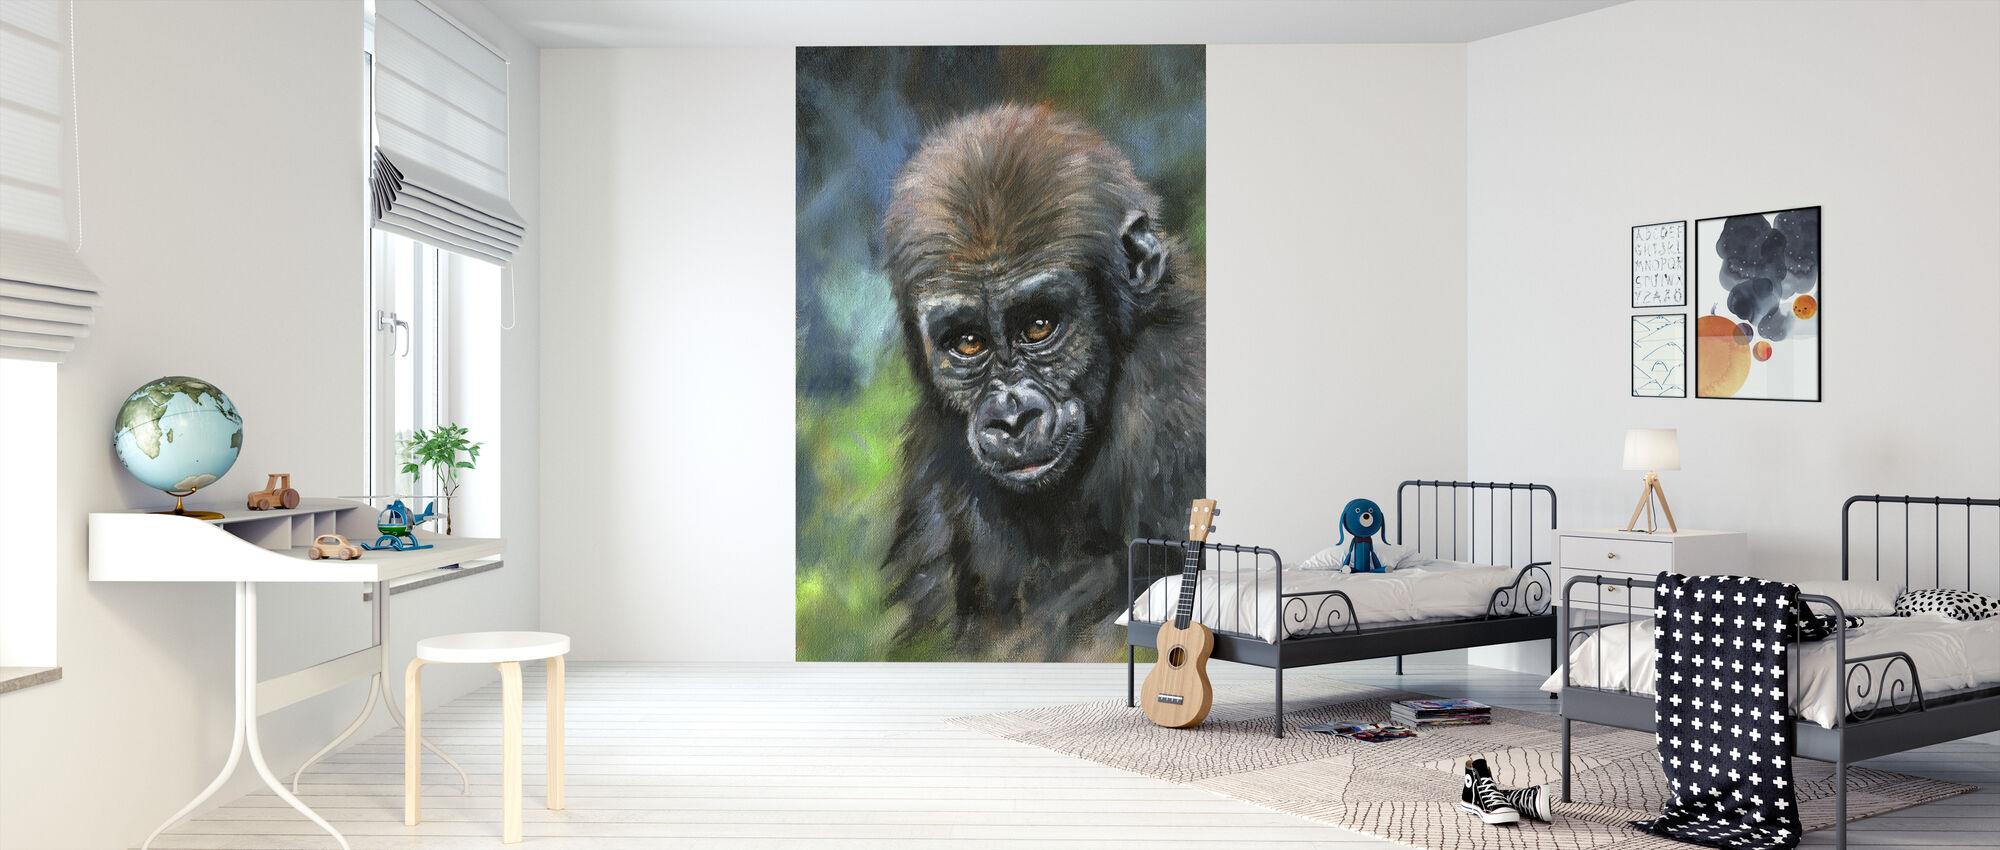 Junge Gorilla - Tapete - Kinderzimmer